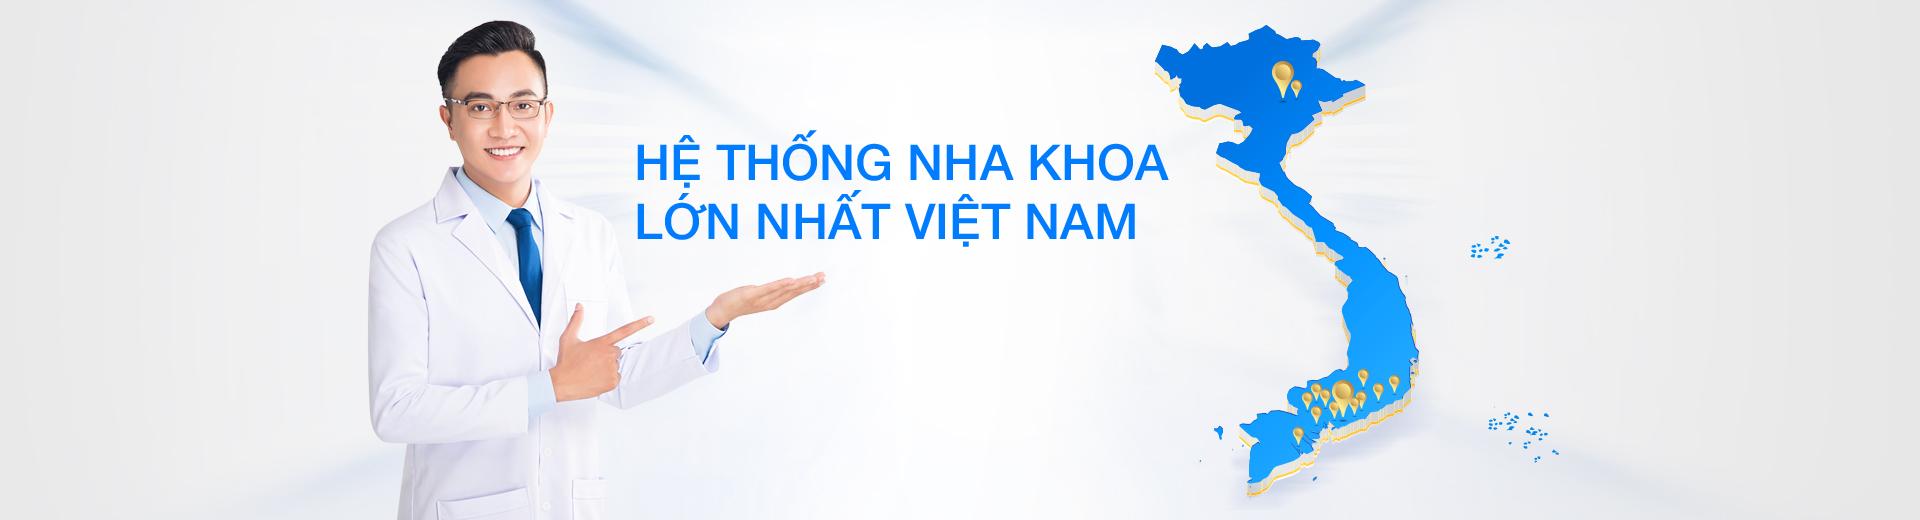 Banner Trang chủ 2